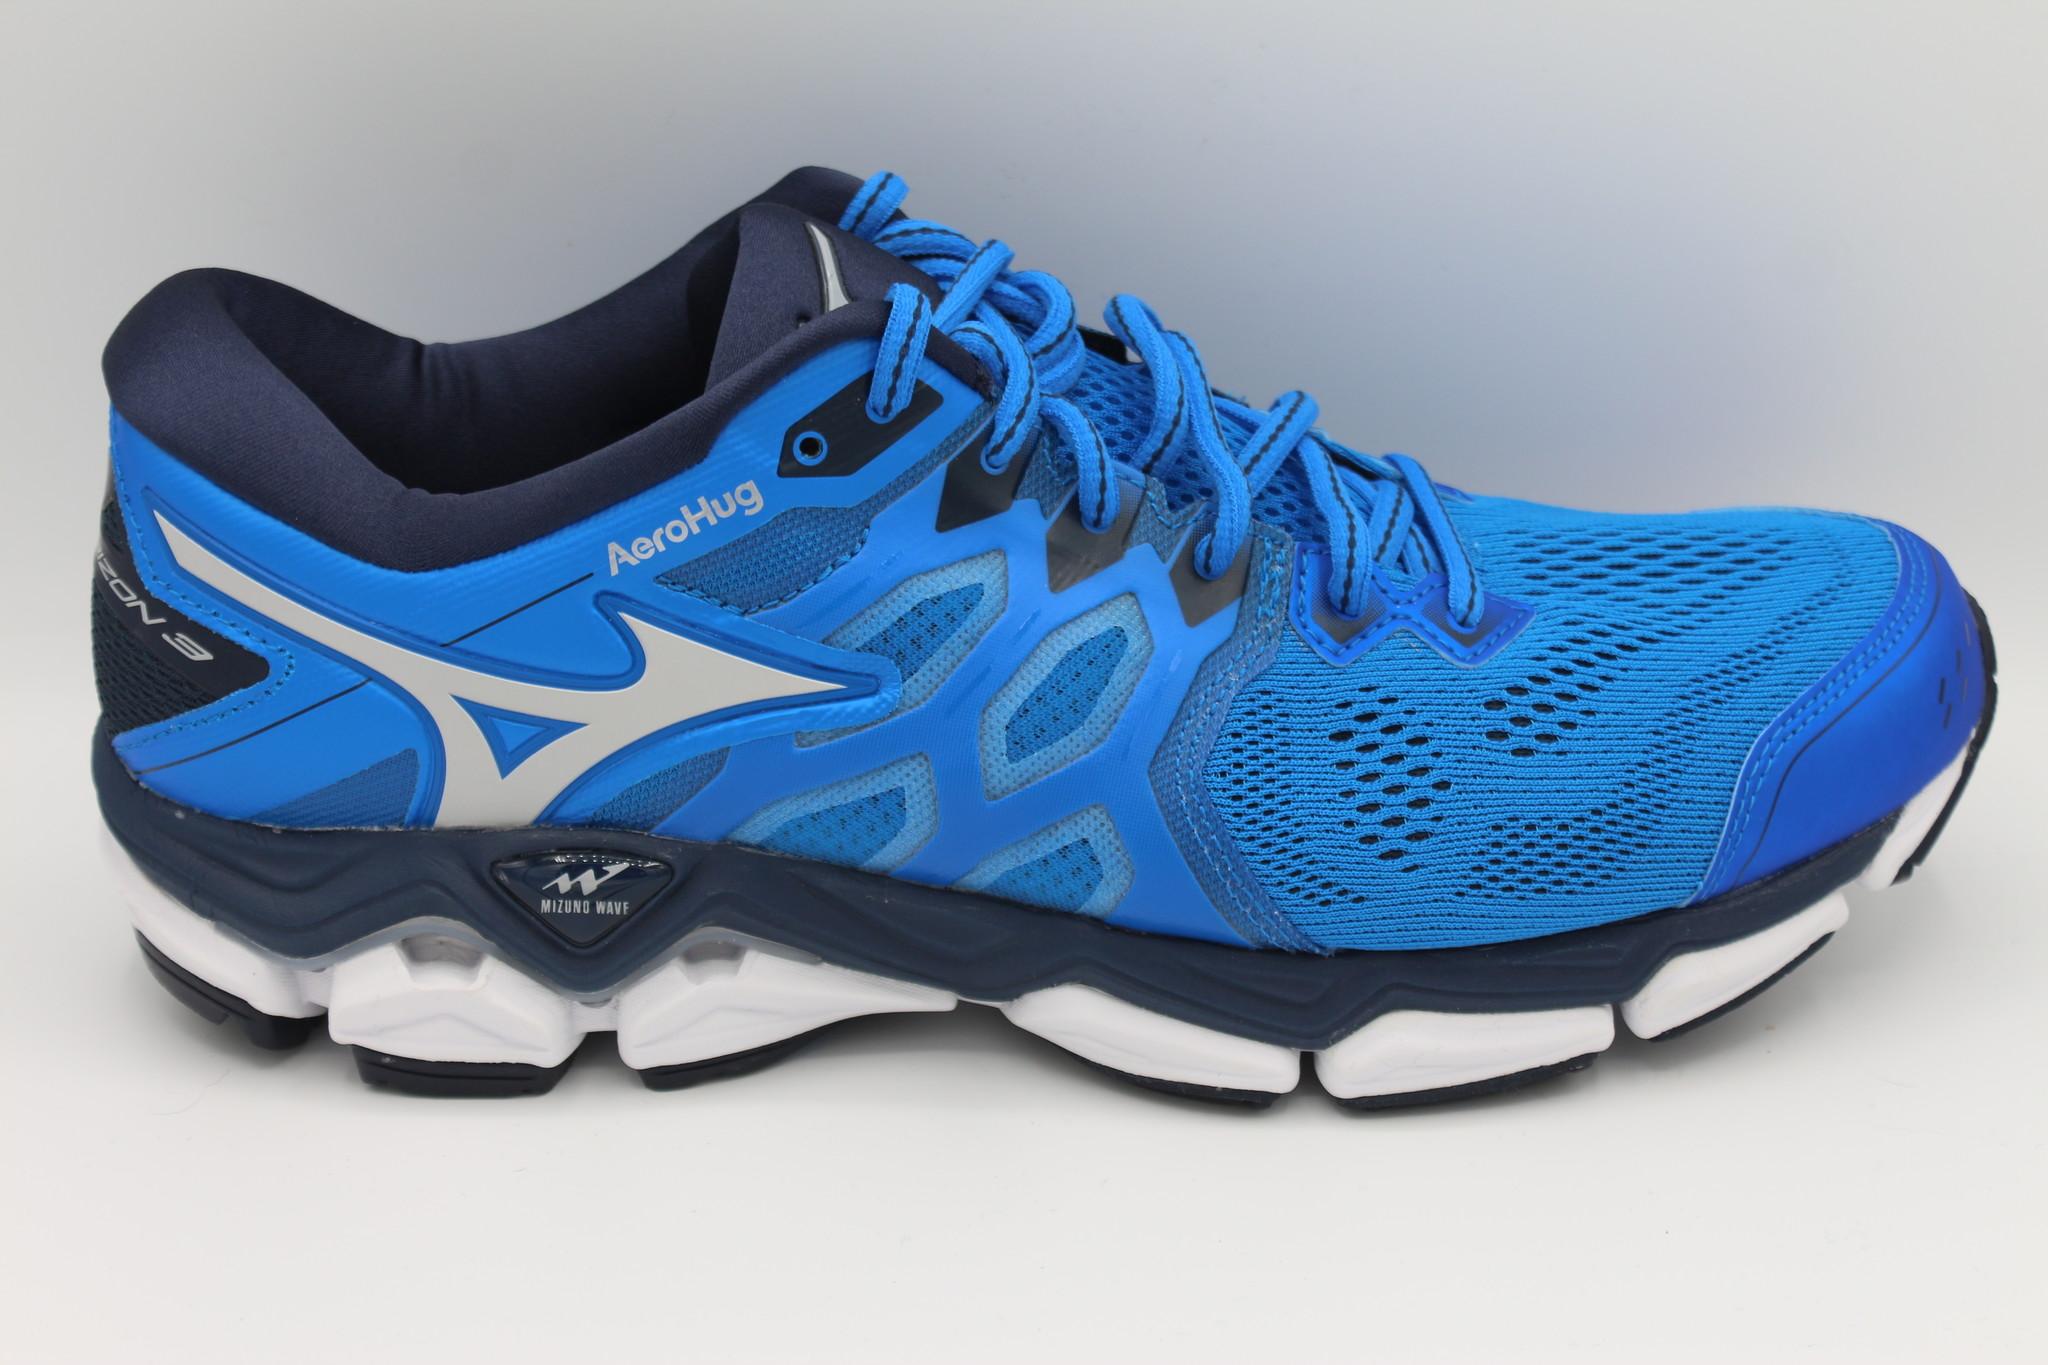 mizuno mens running shoes size 9 youtube black